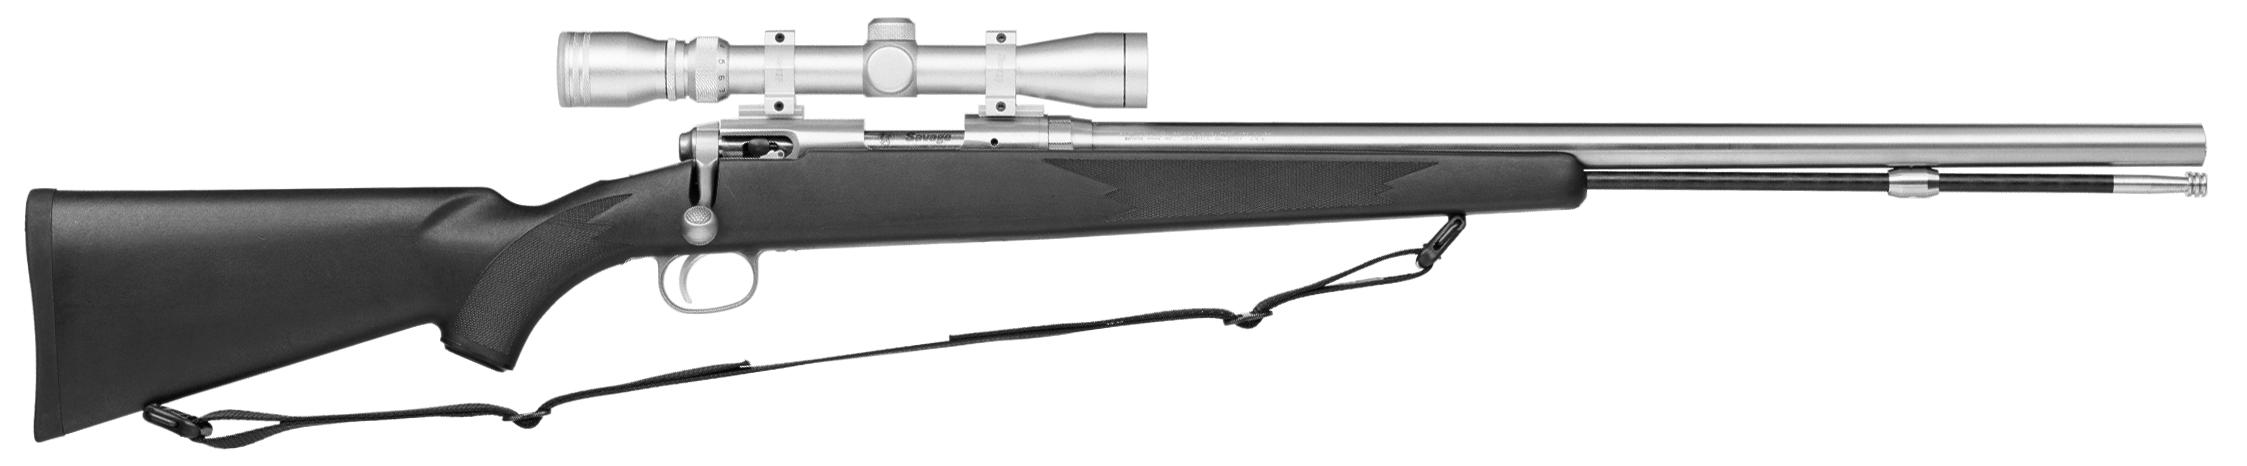 Model 10MLSS-IIXP